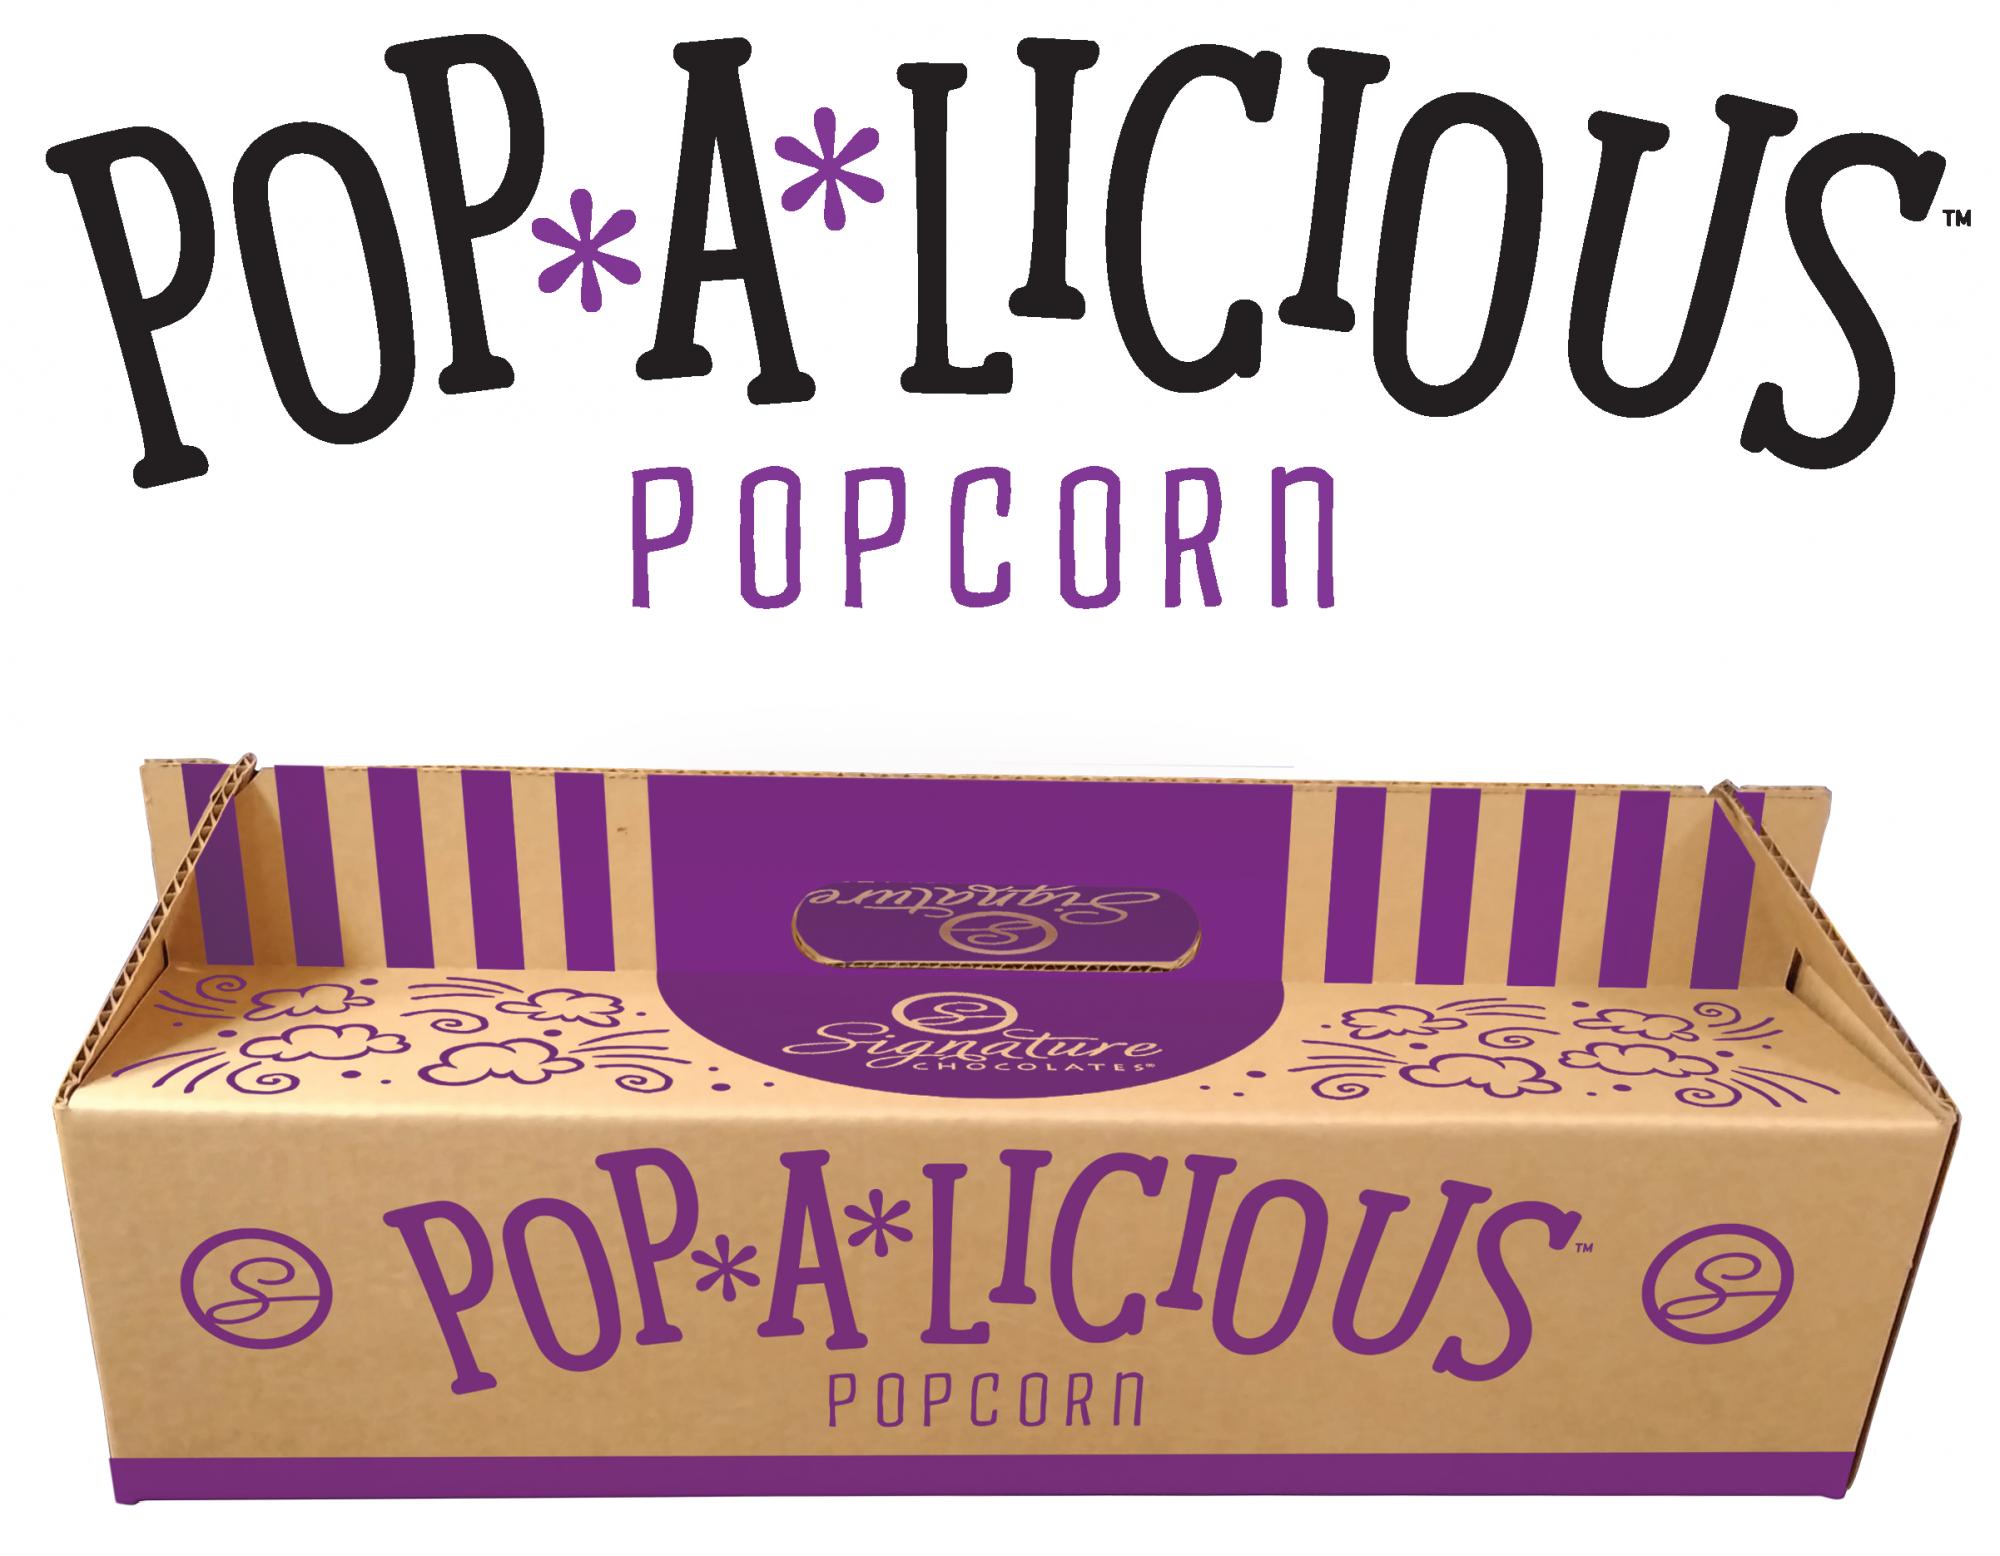 2 Pop A Licious Banner Logo w carrier for website 2